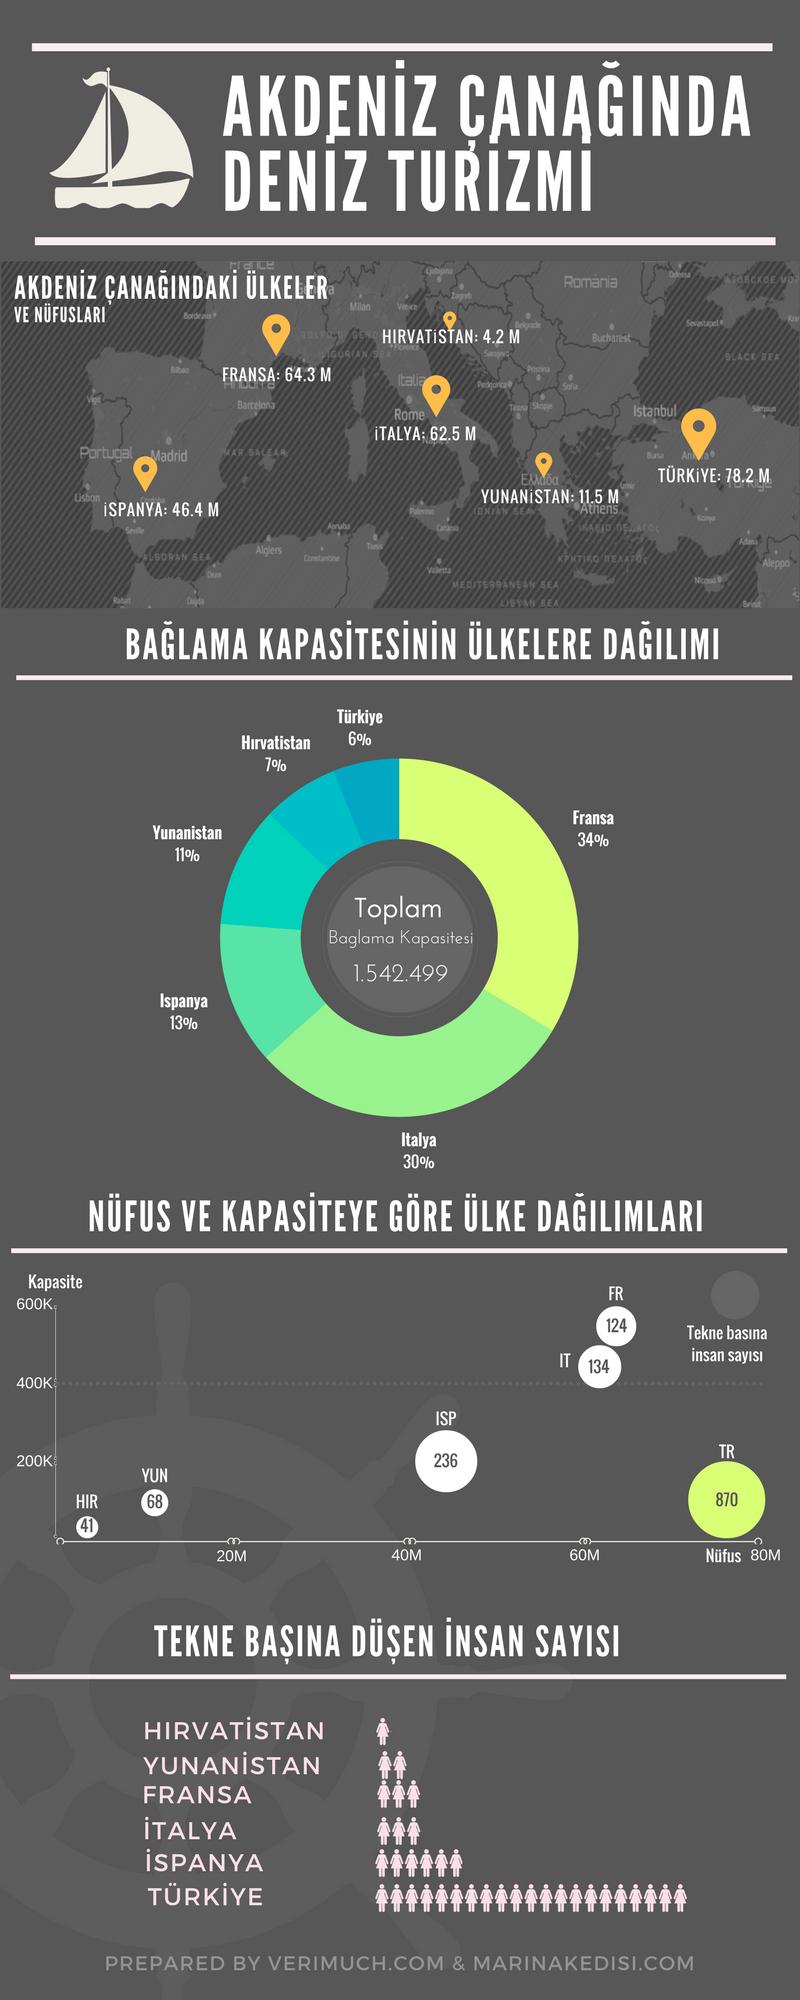 infografakdeniz